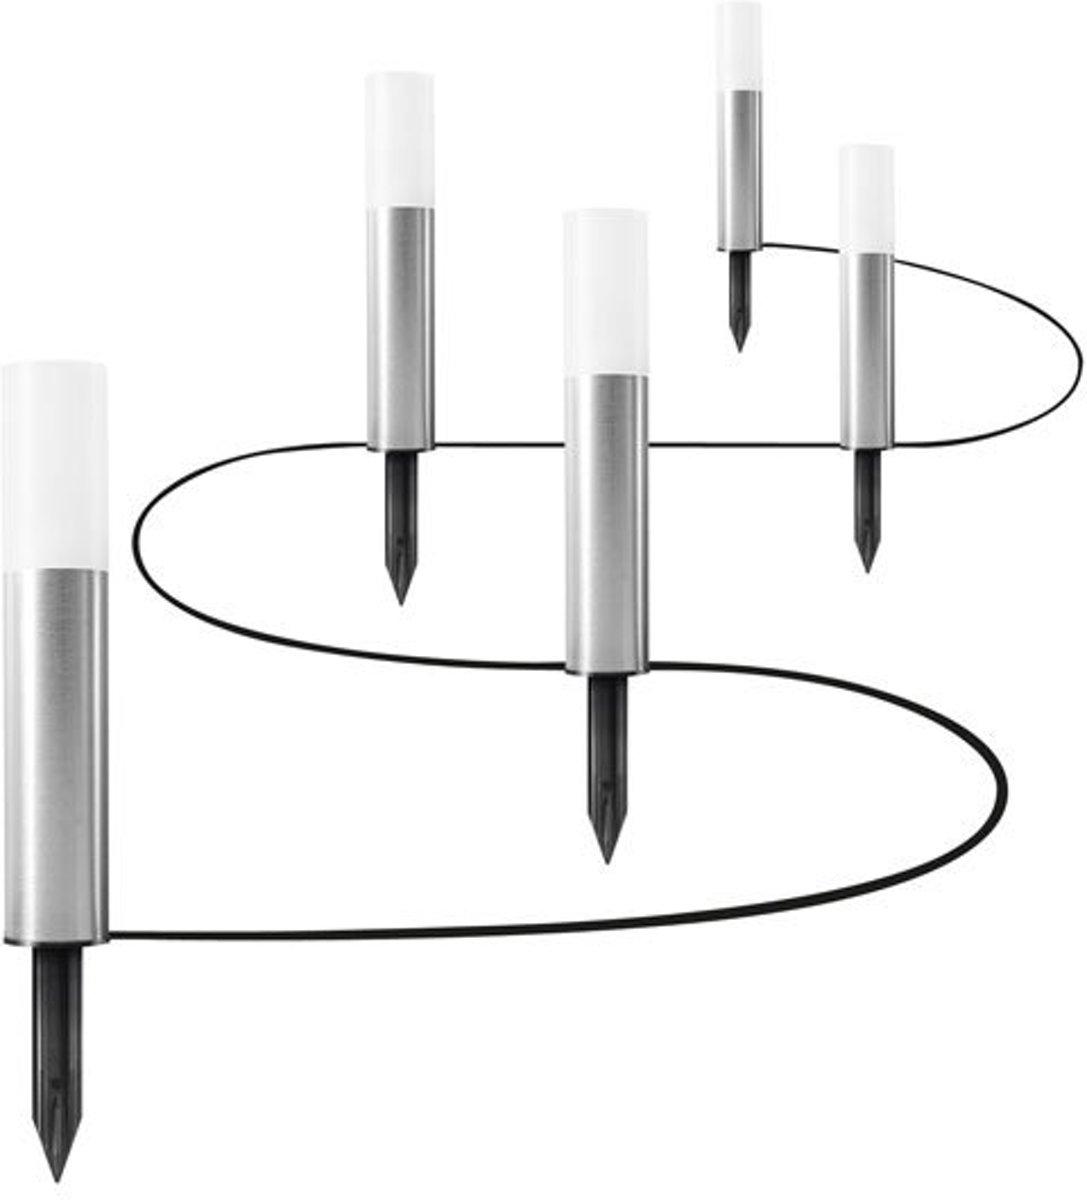 Ledvance 5x LED grondspies zilver 5.5W Endura Garden Pole kopen